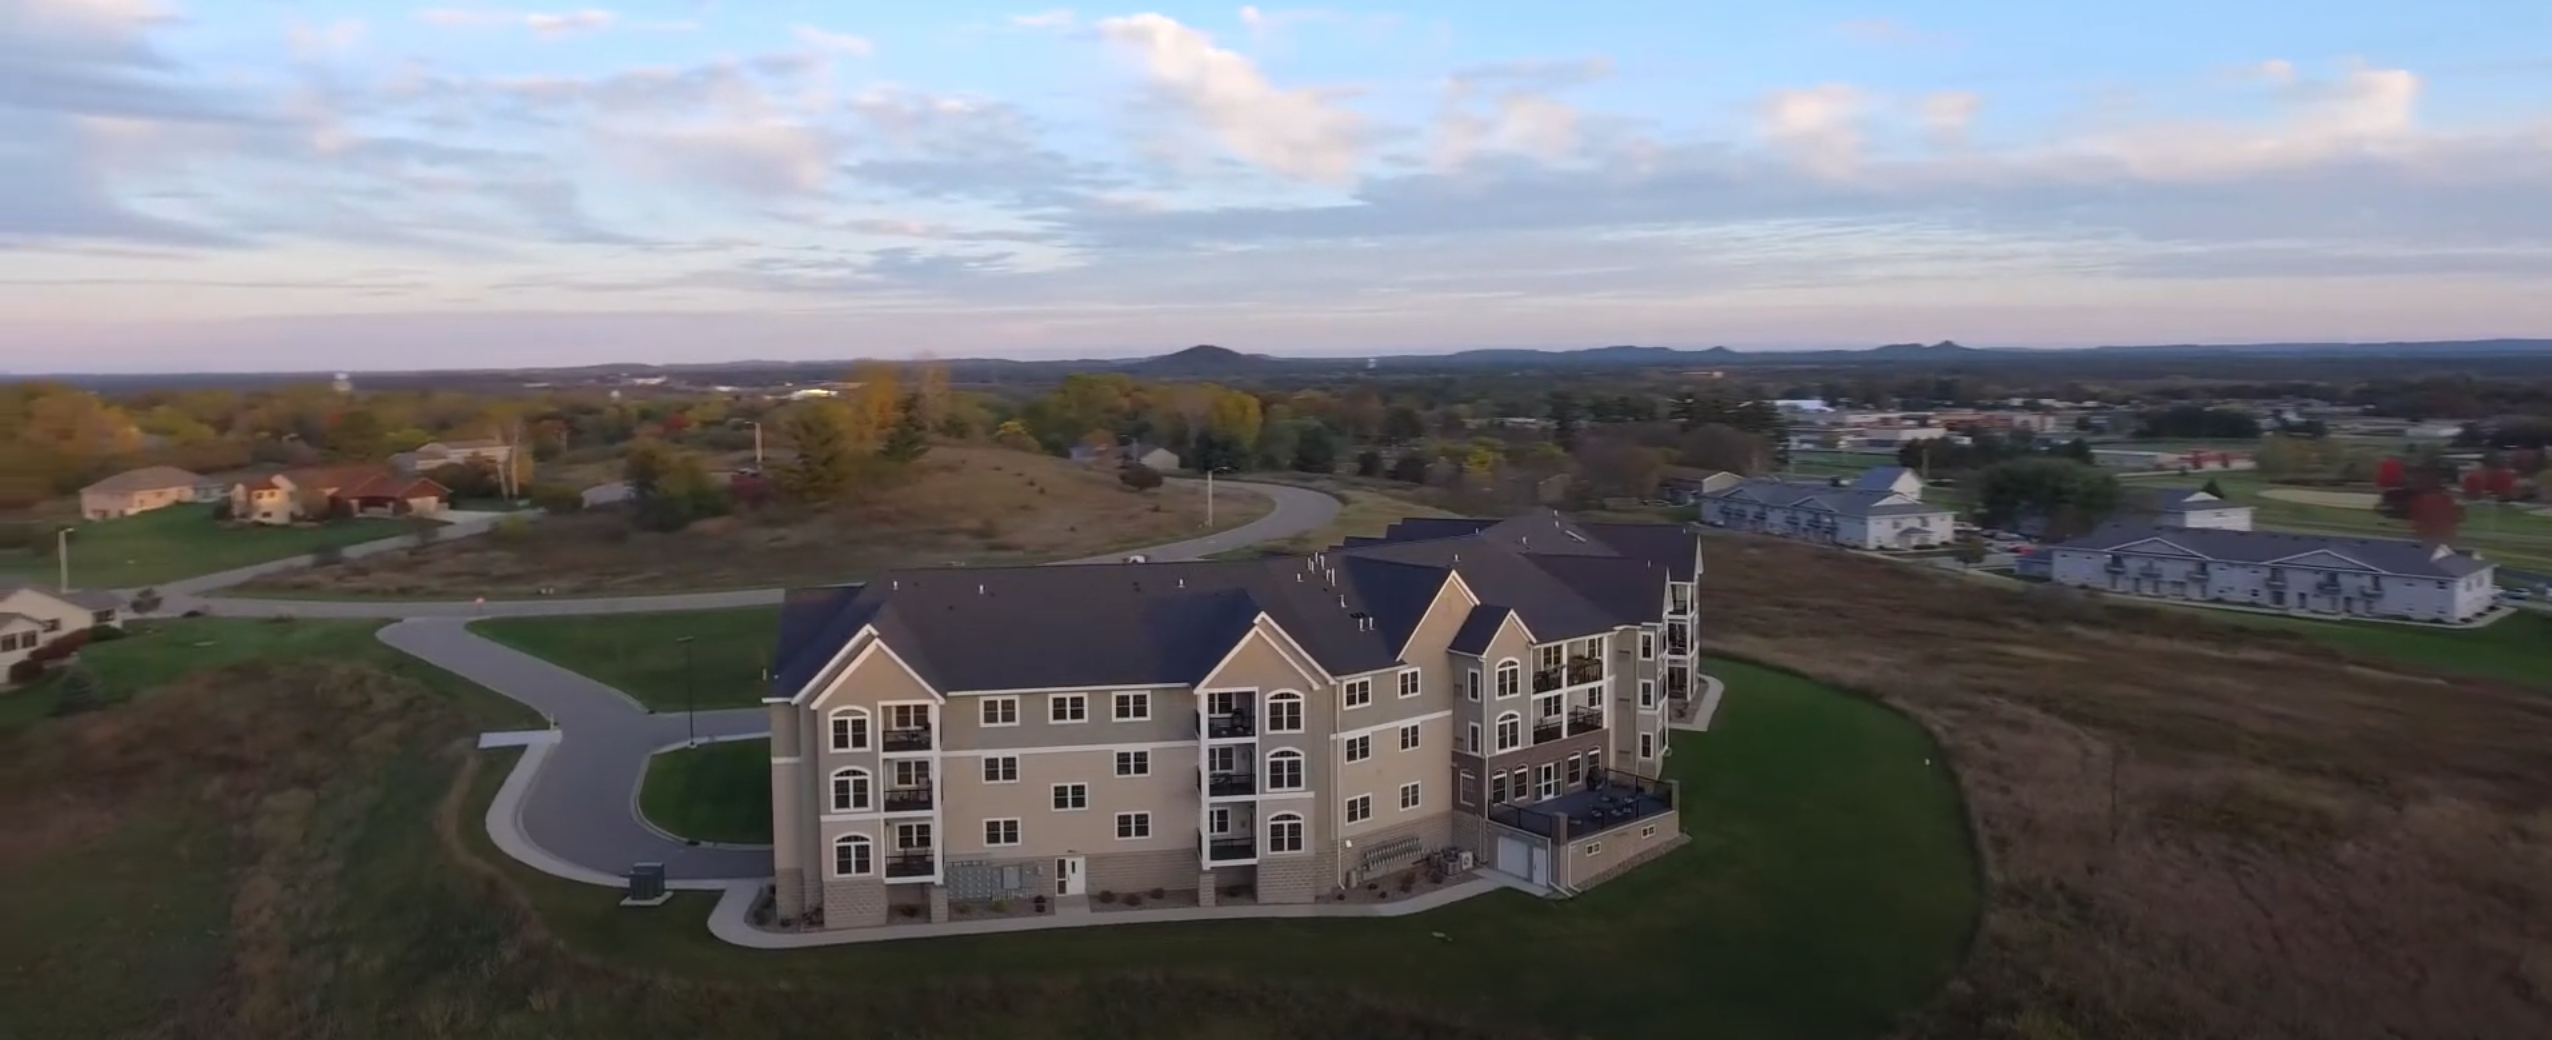 Senior Housing in Black River Falls, Wisconsin